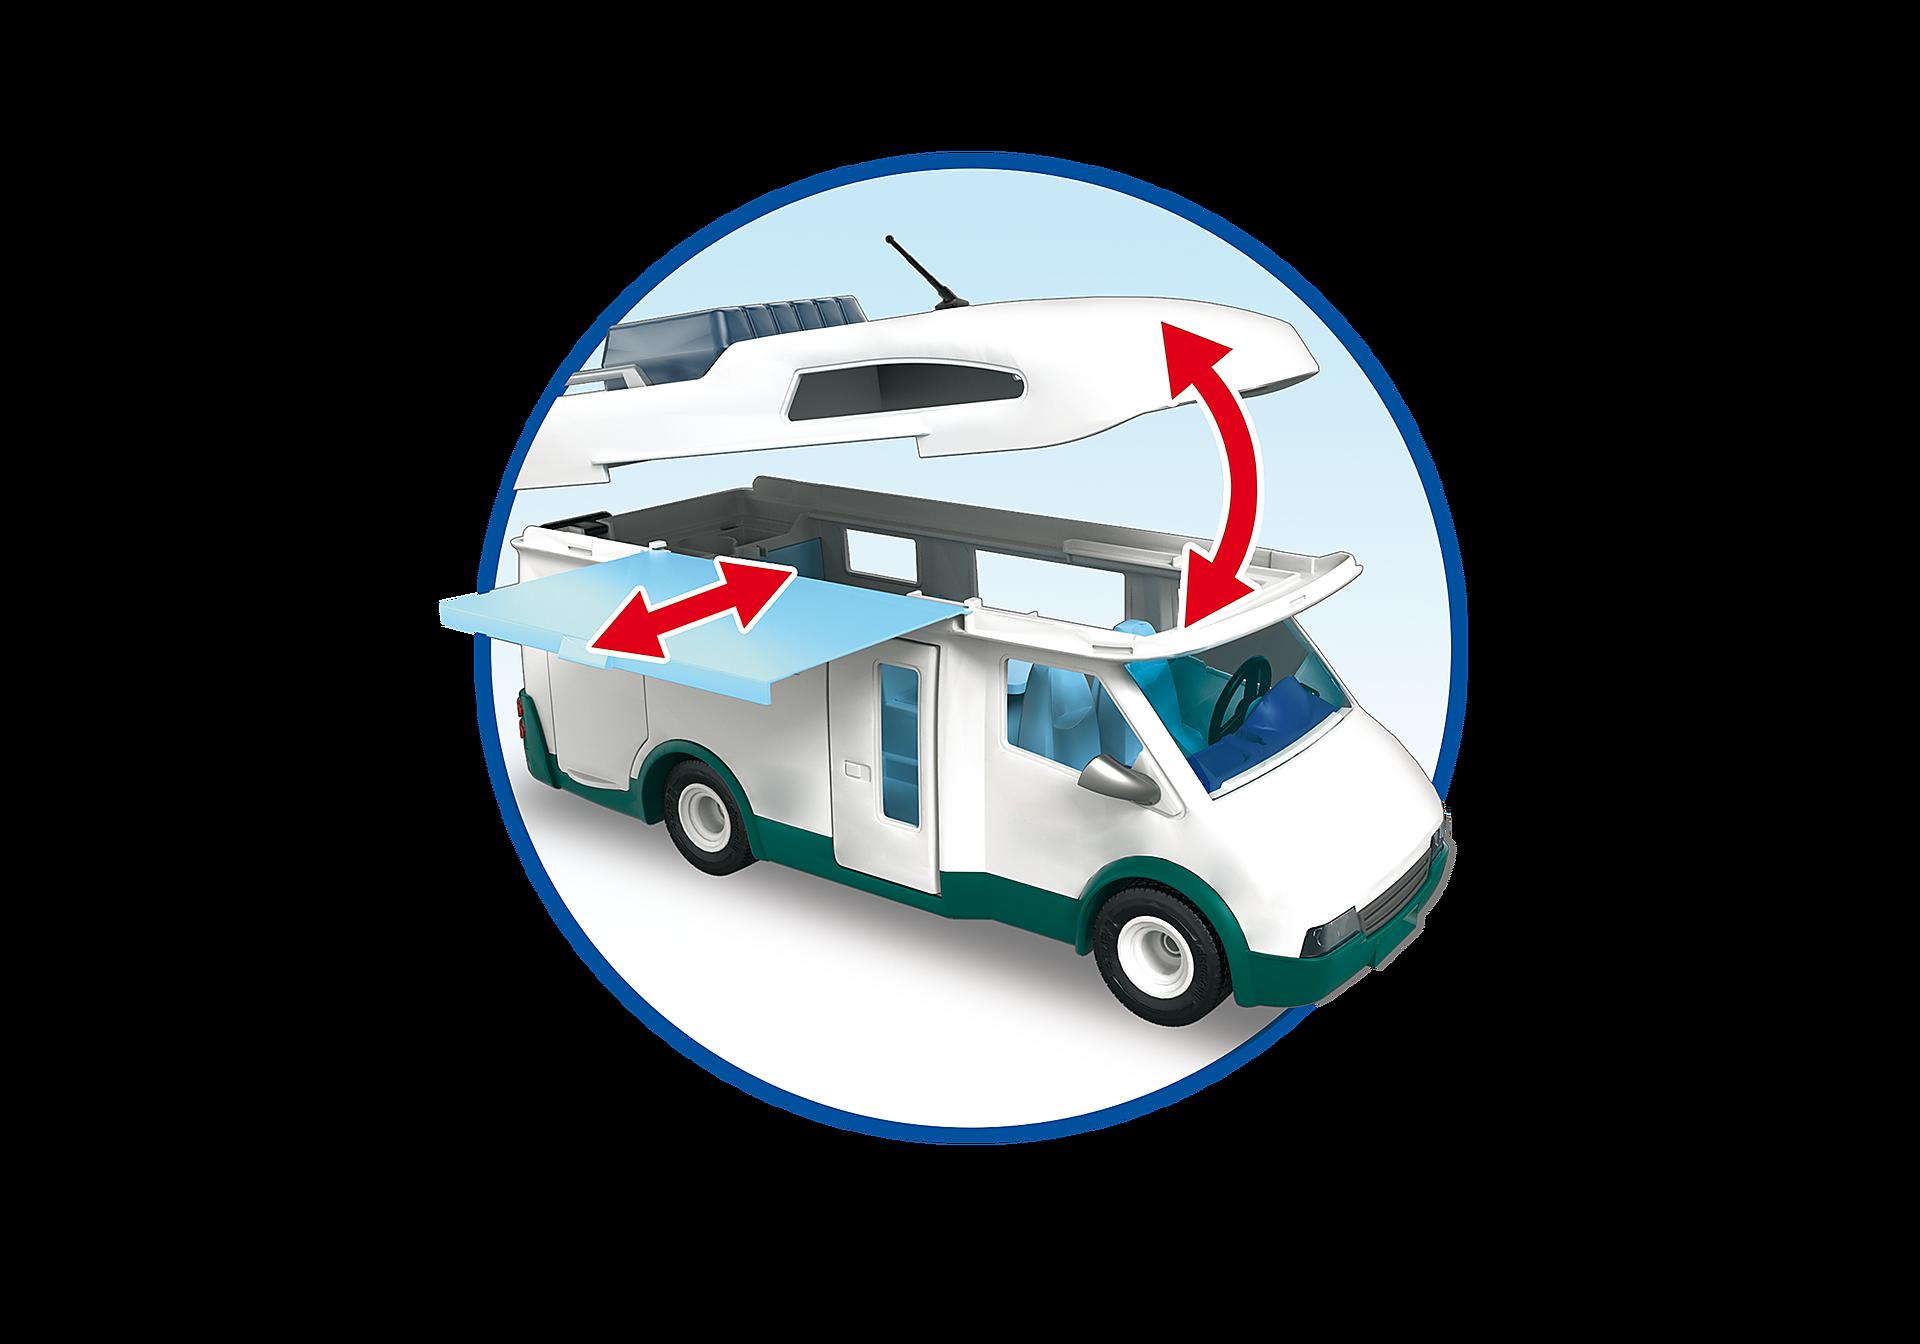 http://media.playmobil.com/i/playmobil/6671_product_extra3/Rodzinne auto kempingowe